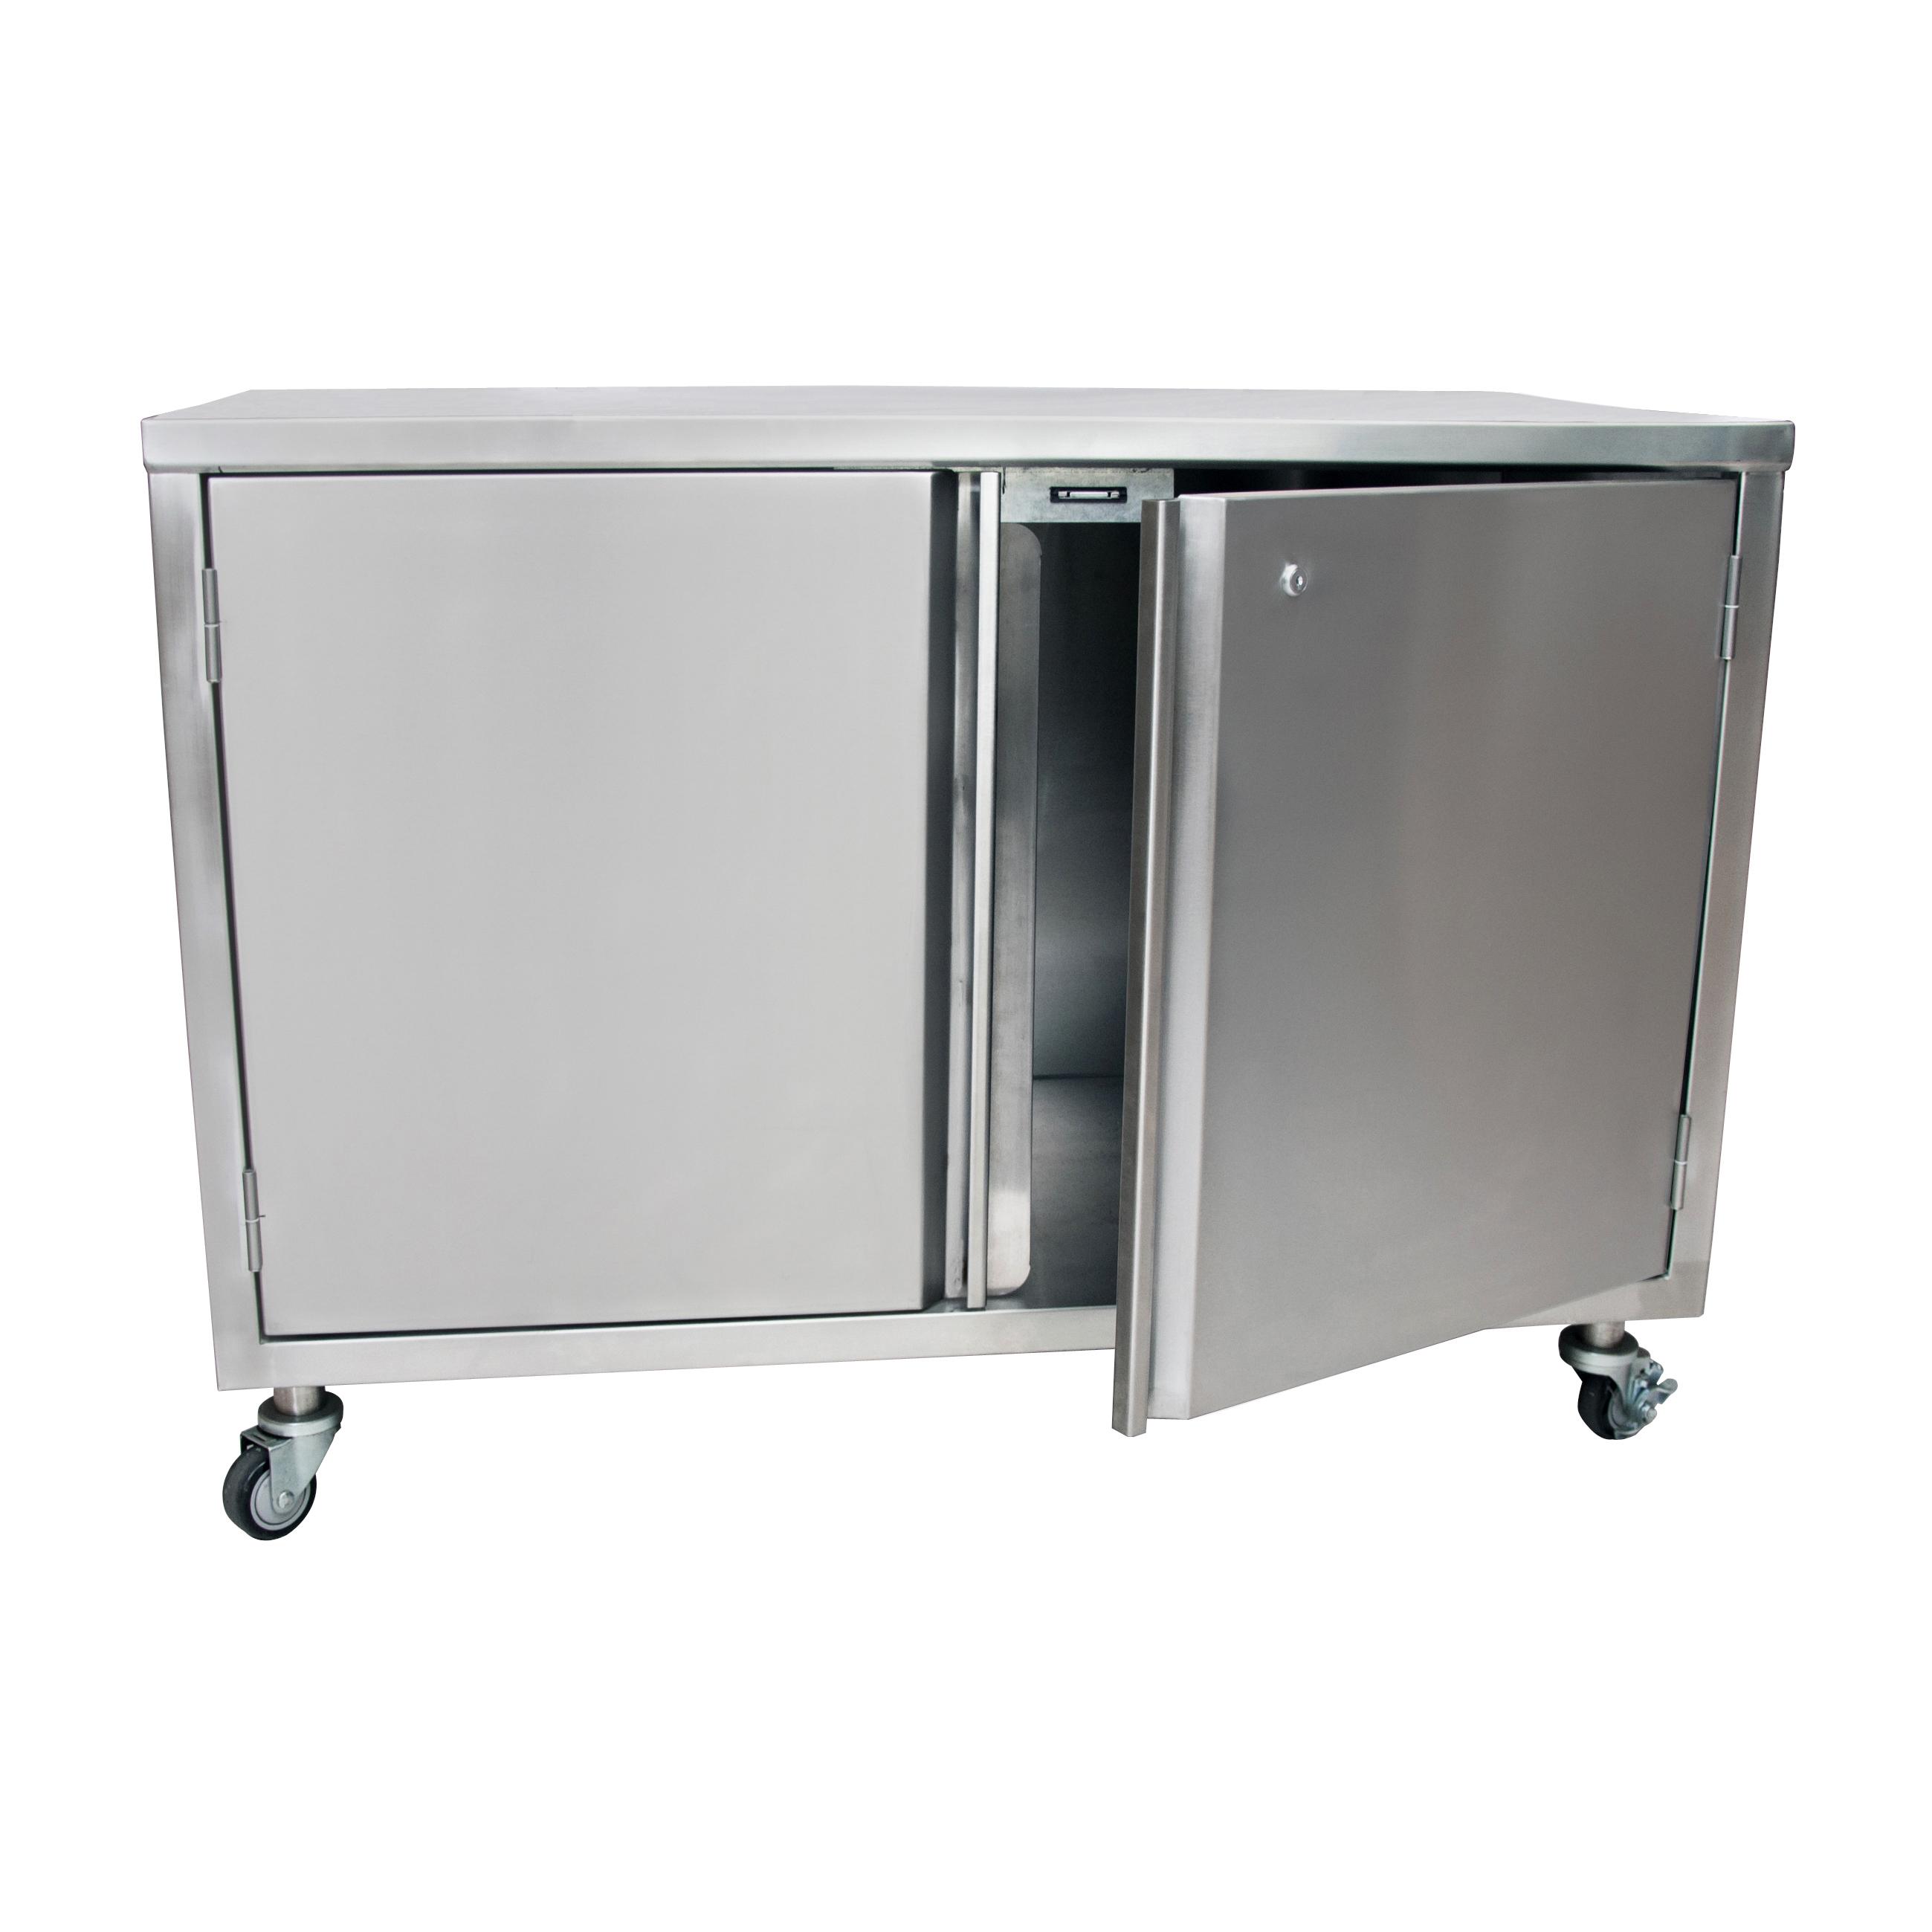 BK Resources BKDC-3096HL work table, cabinet base hinged doors